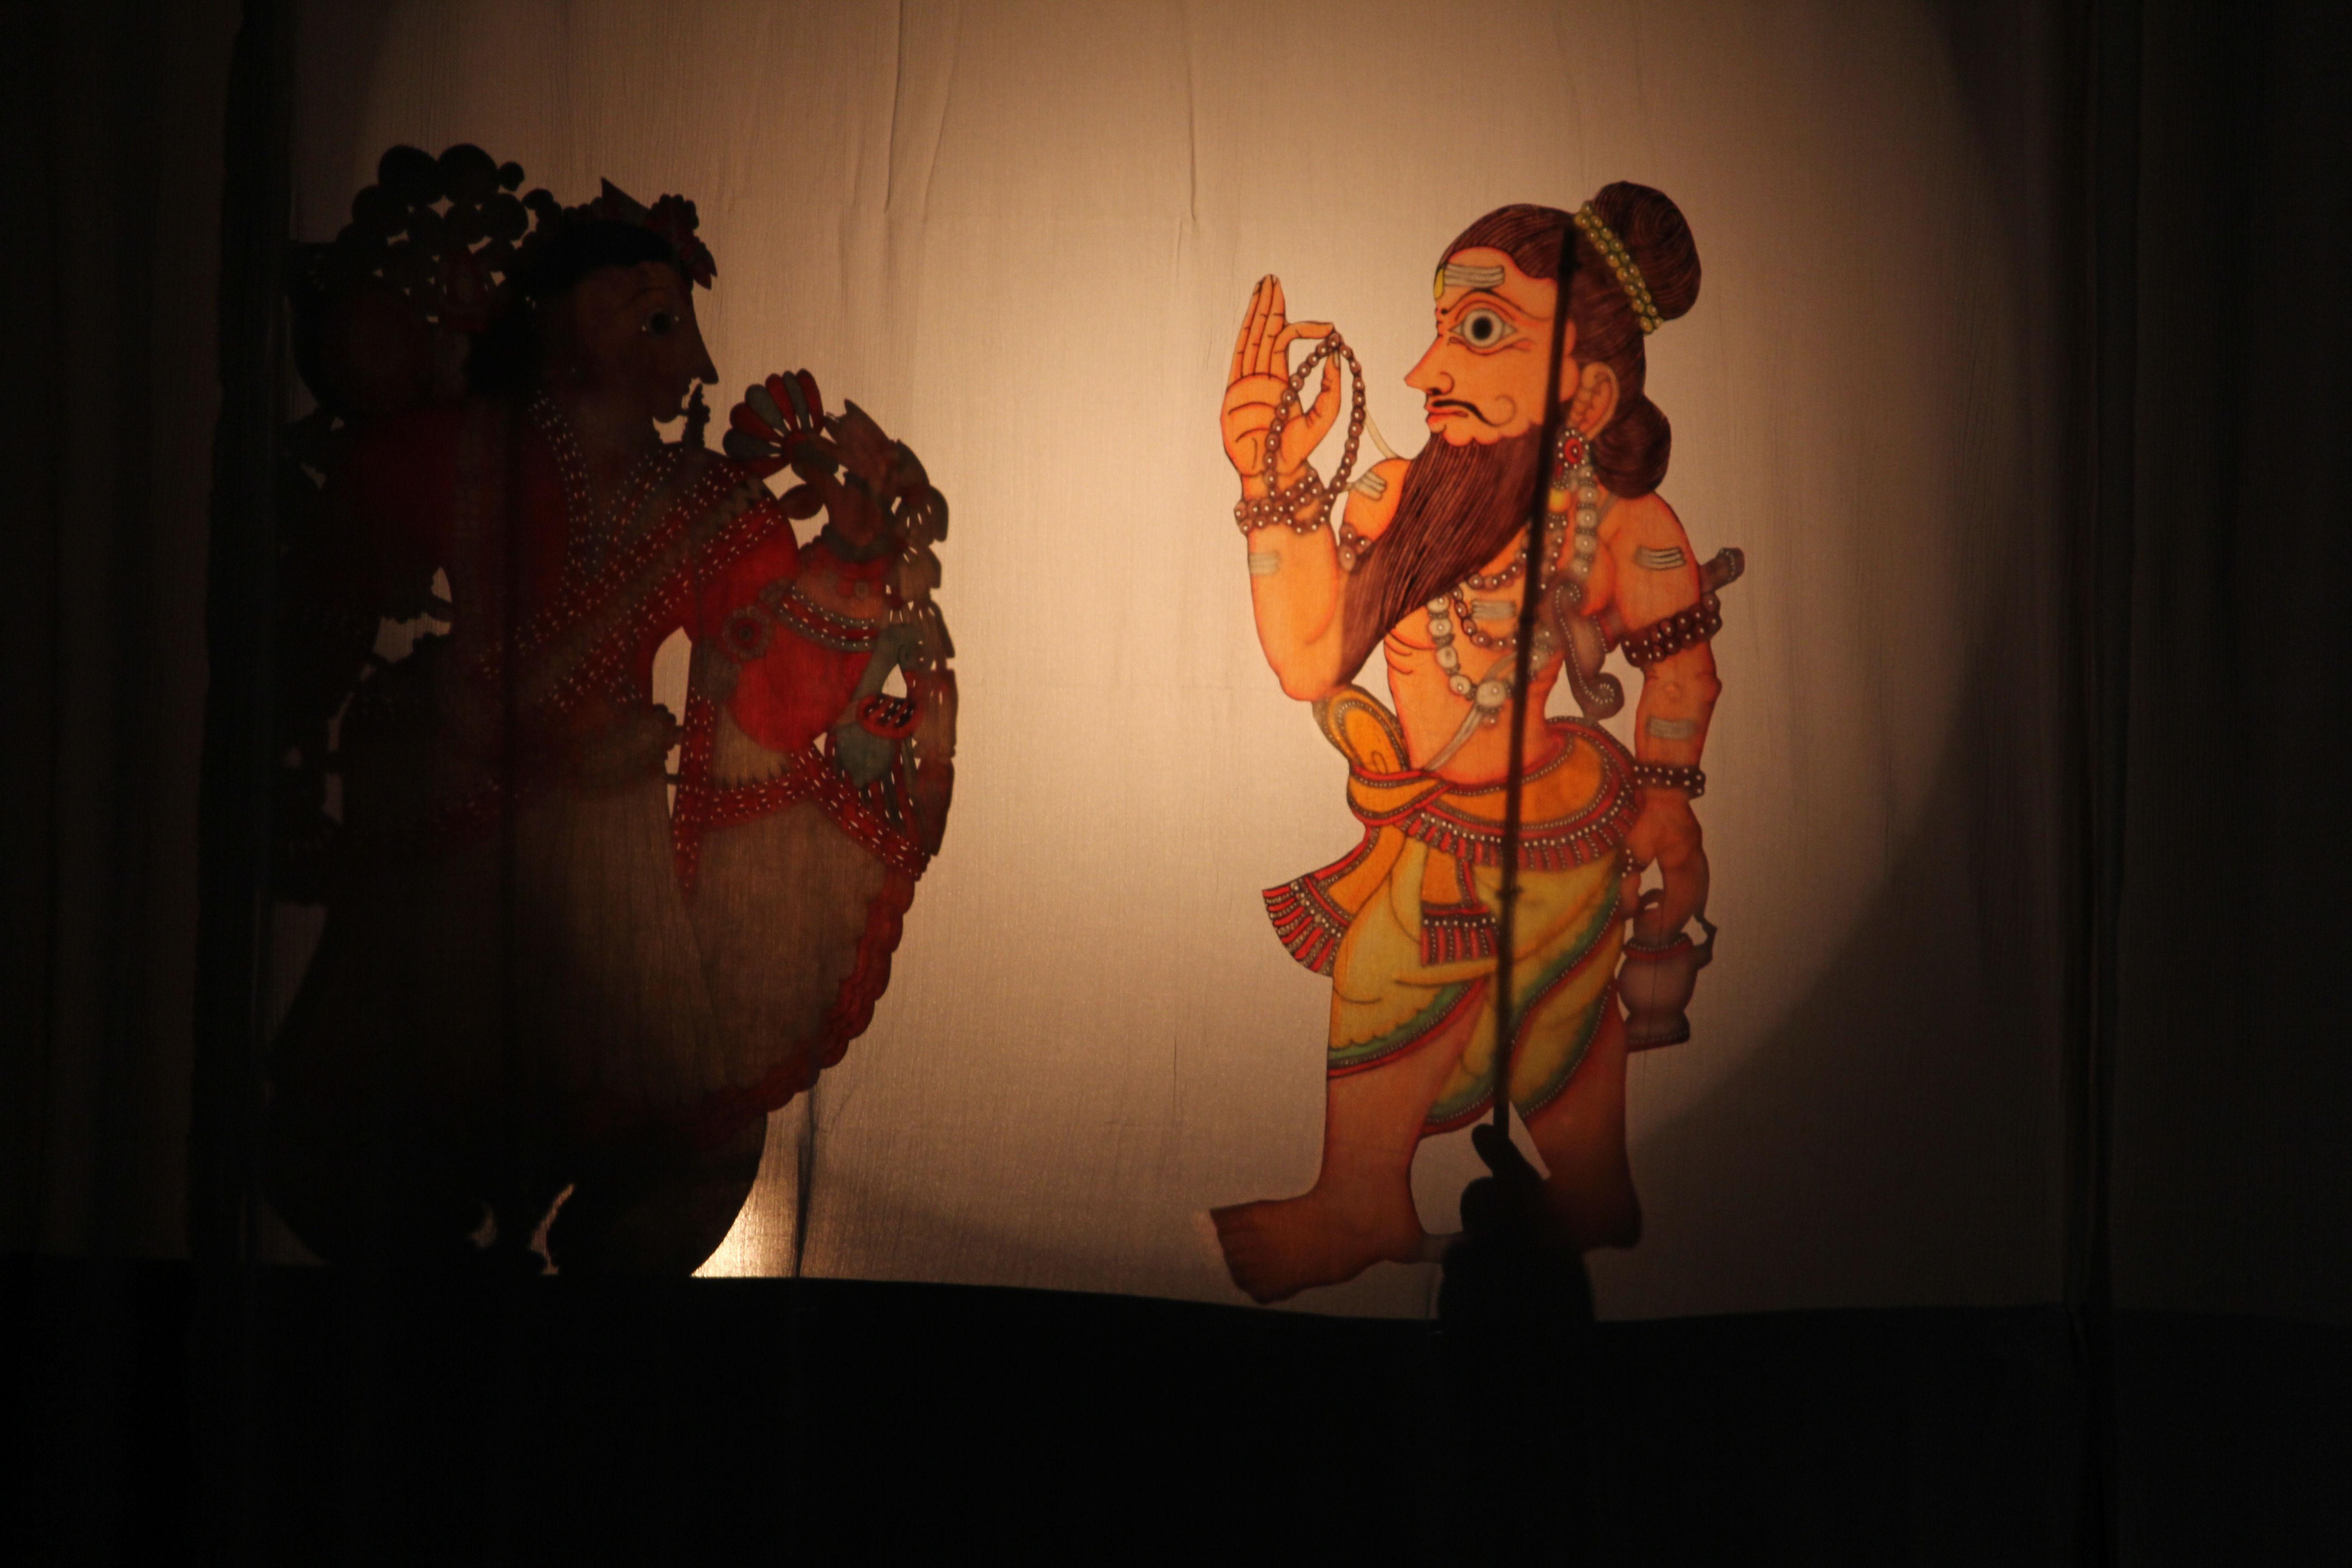 <em>Mahabharata</em> par Katkatha (New Delhi), concept et mise en scène : Anurupa Roy, marionnettistes : Mohammad Shameem, Vivek Kumar, Anurupa Roy, Avinash Kumar, Gunduraju. Marionnettes d'ombres par Gunduraju